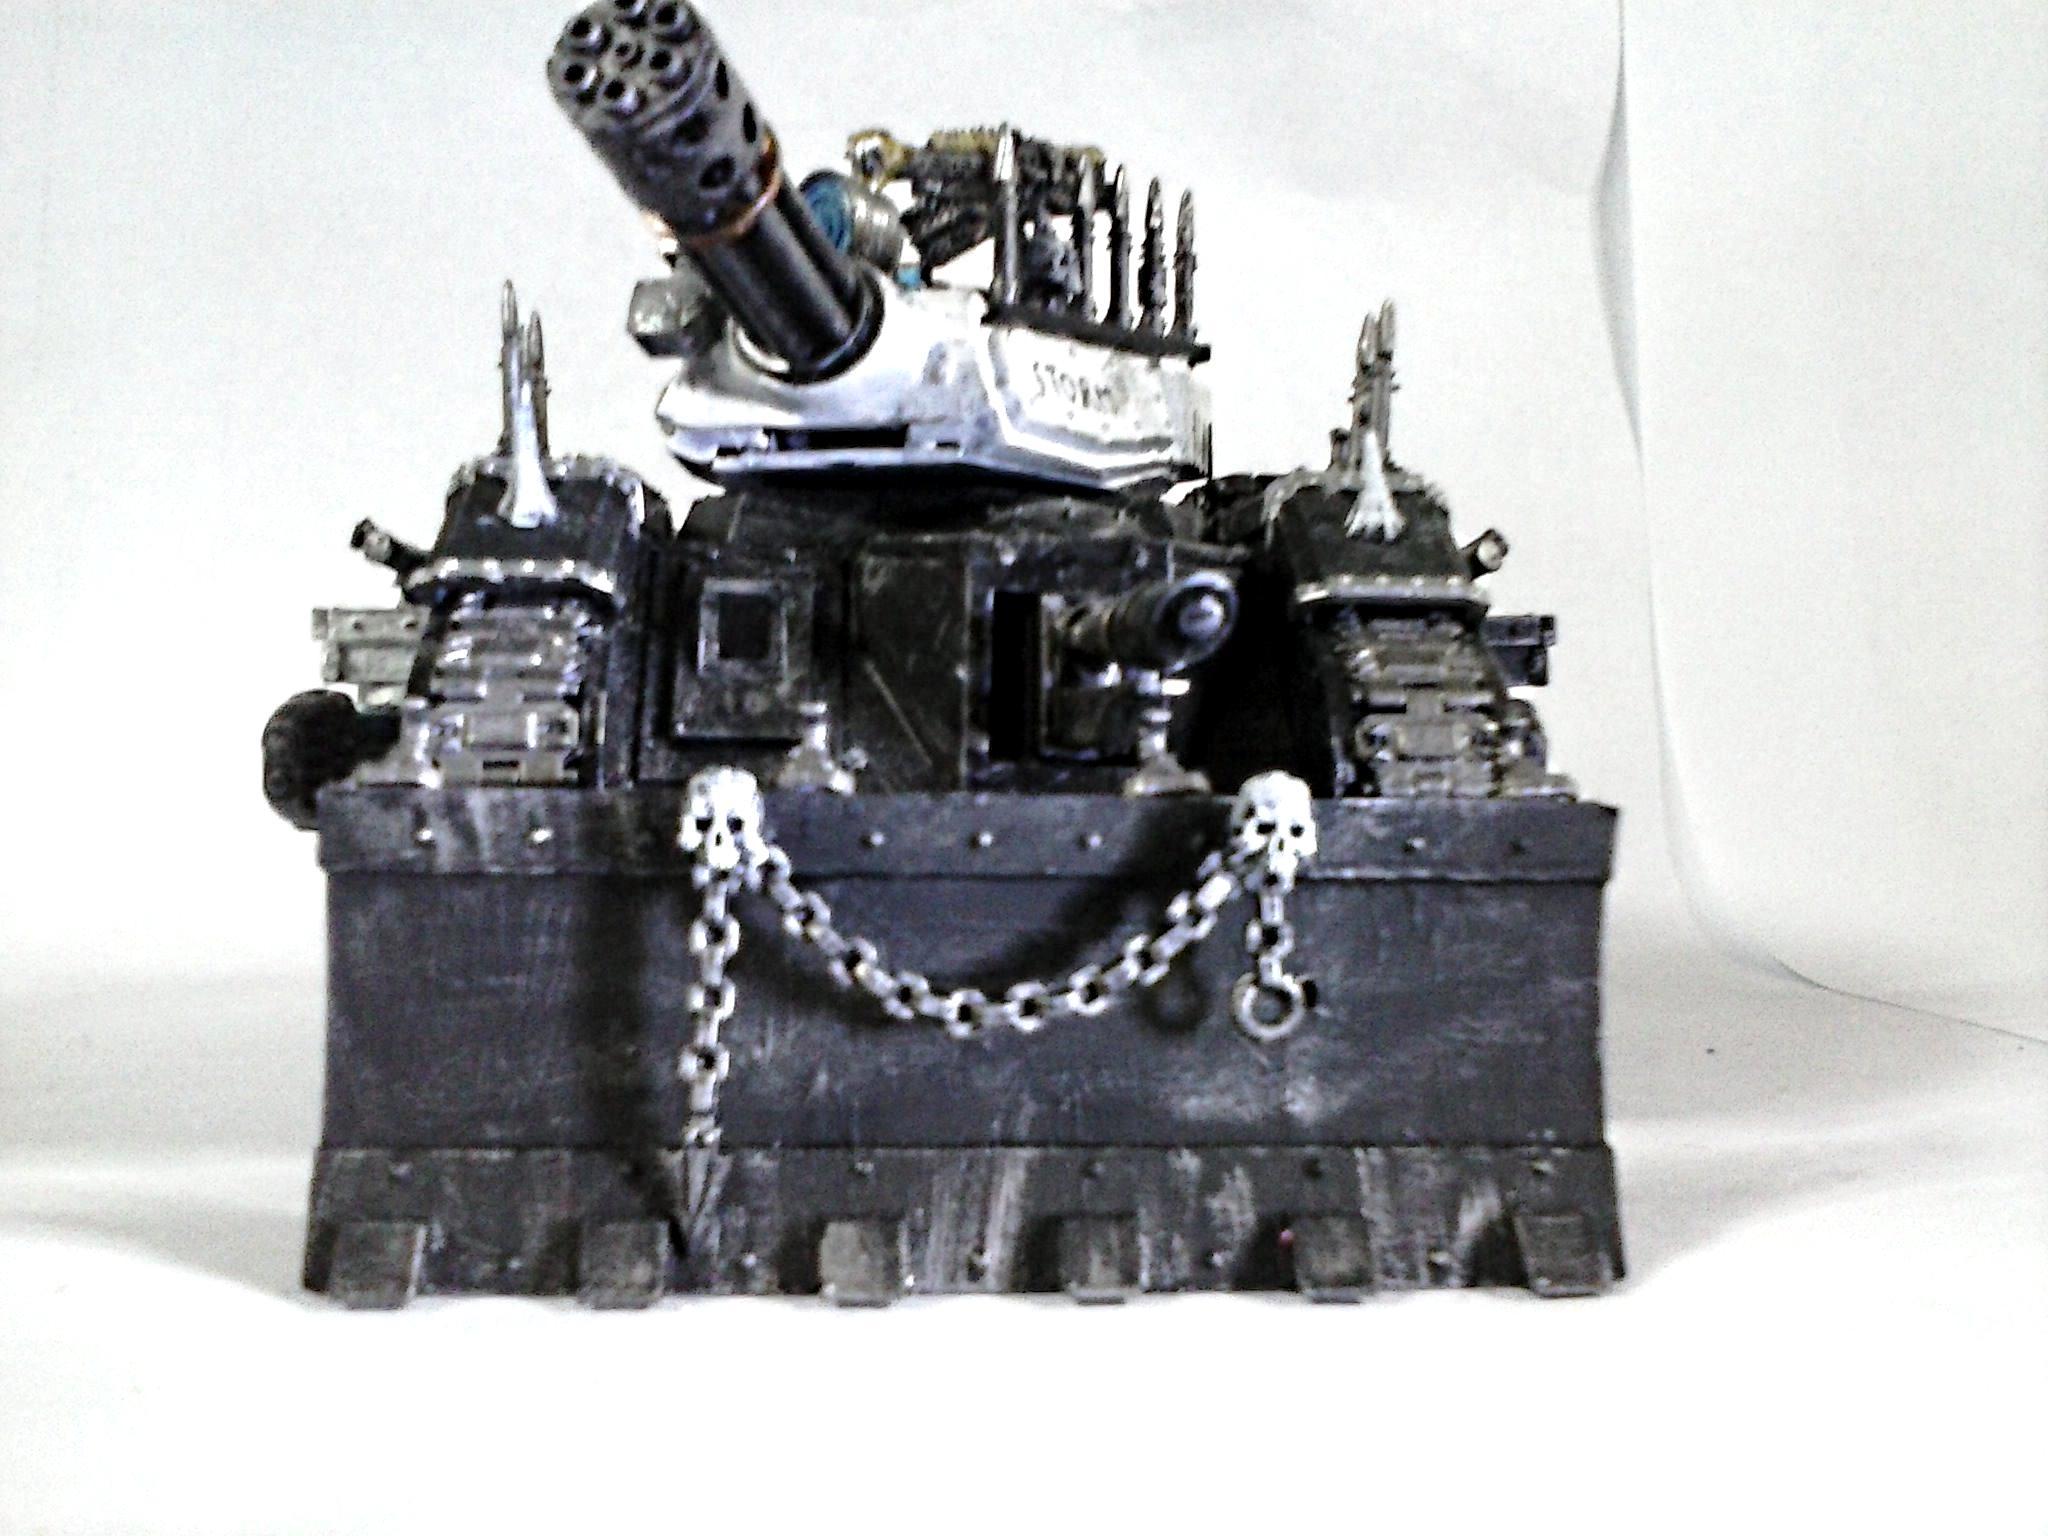 Apostles, Assault, Balrog, Black, Bolter, Chaos, Chevron, Chimera, Conversion, Daemons, Dark, Dreadnought, Fire, Gun, Hazard, Headquarters, Heavy, Khorne, Kranon, Leader, Legion, Leman Russ, Linked, Lord, Multi Laser, On, Orks, Pirate, Pirates, Plasma, Power, Powerklaw, Prince, Punisher, Reach, Relentless, Space, Space Marines, Spiky, Stripes, Sword, Tank, Transport, Twin, Vengeance, Walker, Wash, Weapon, White, Winged